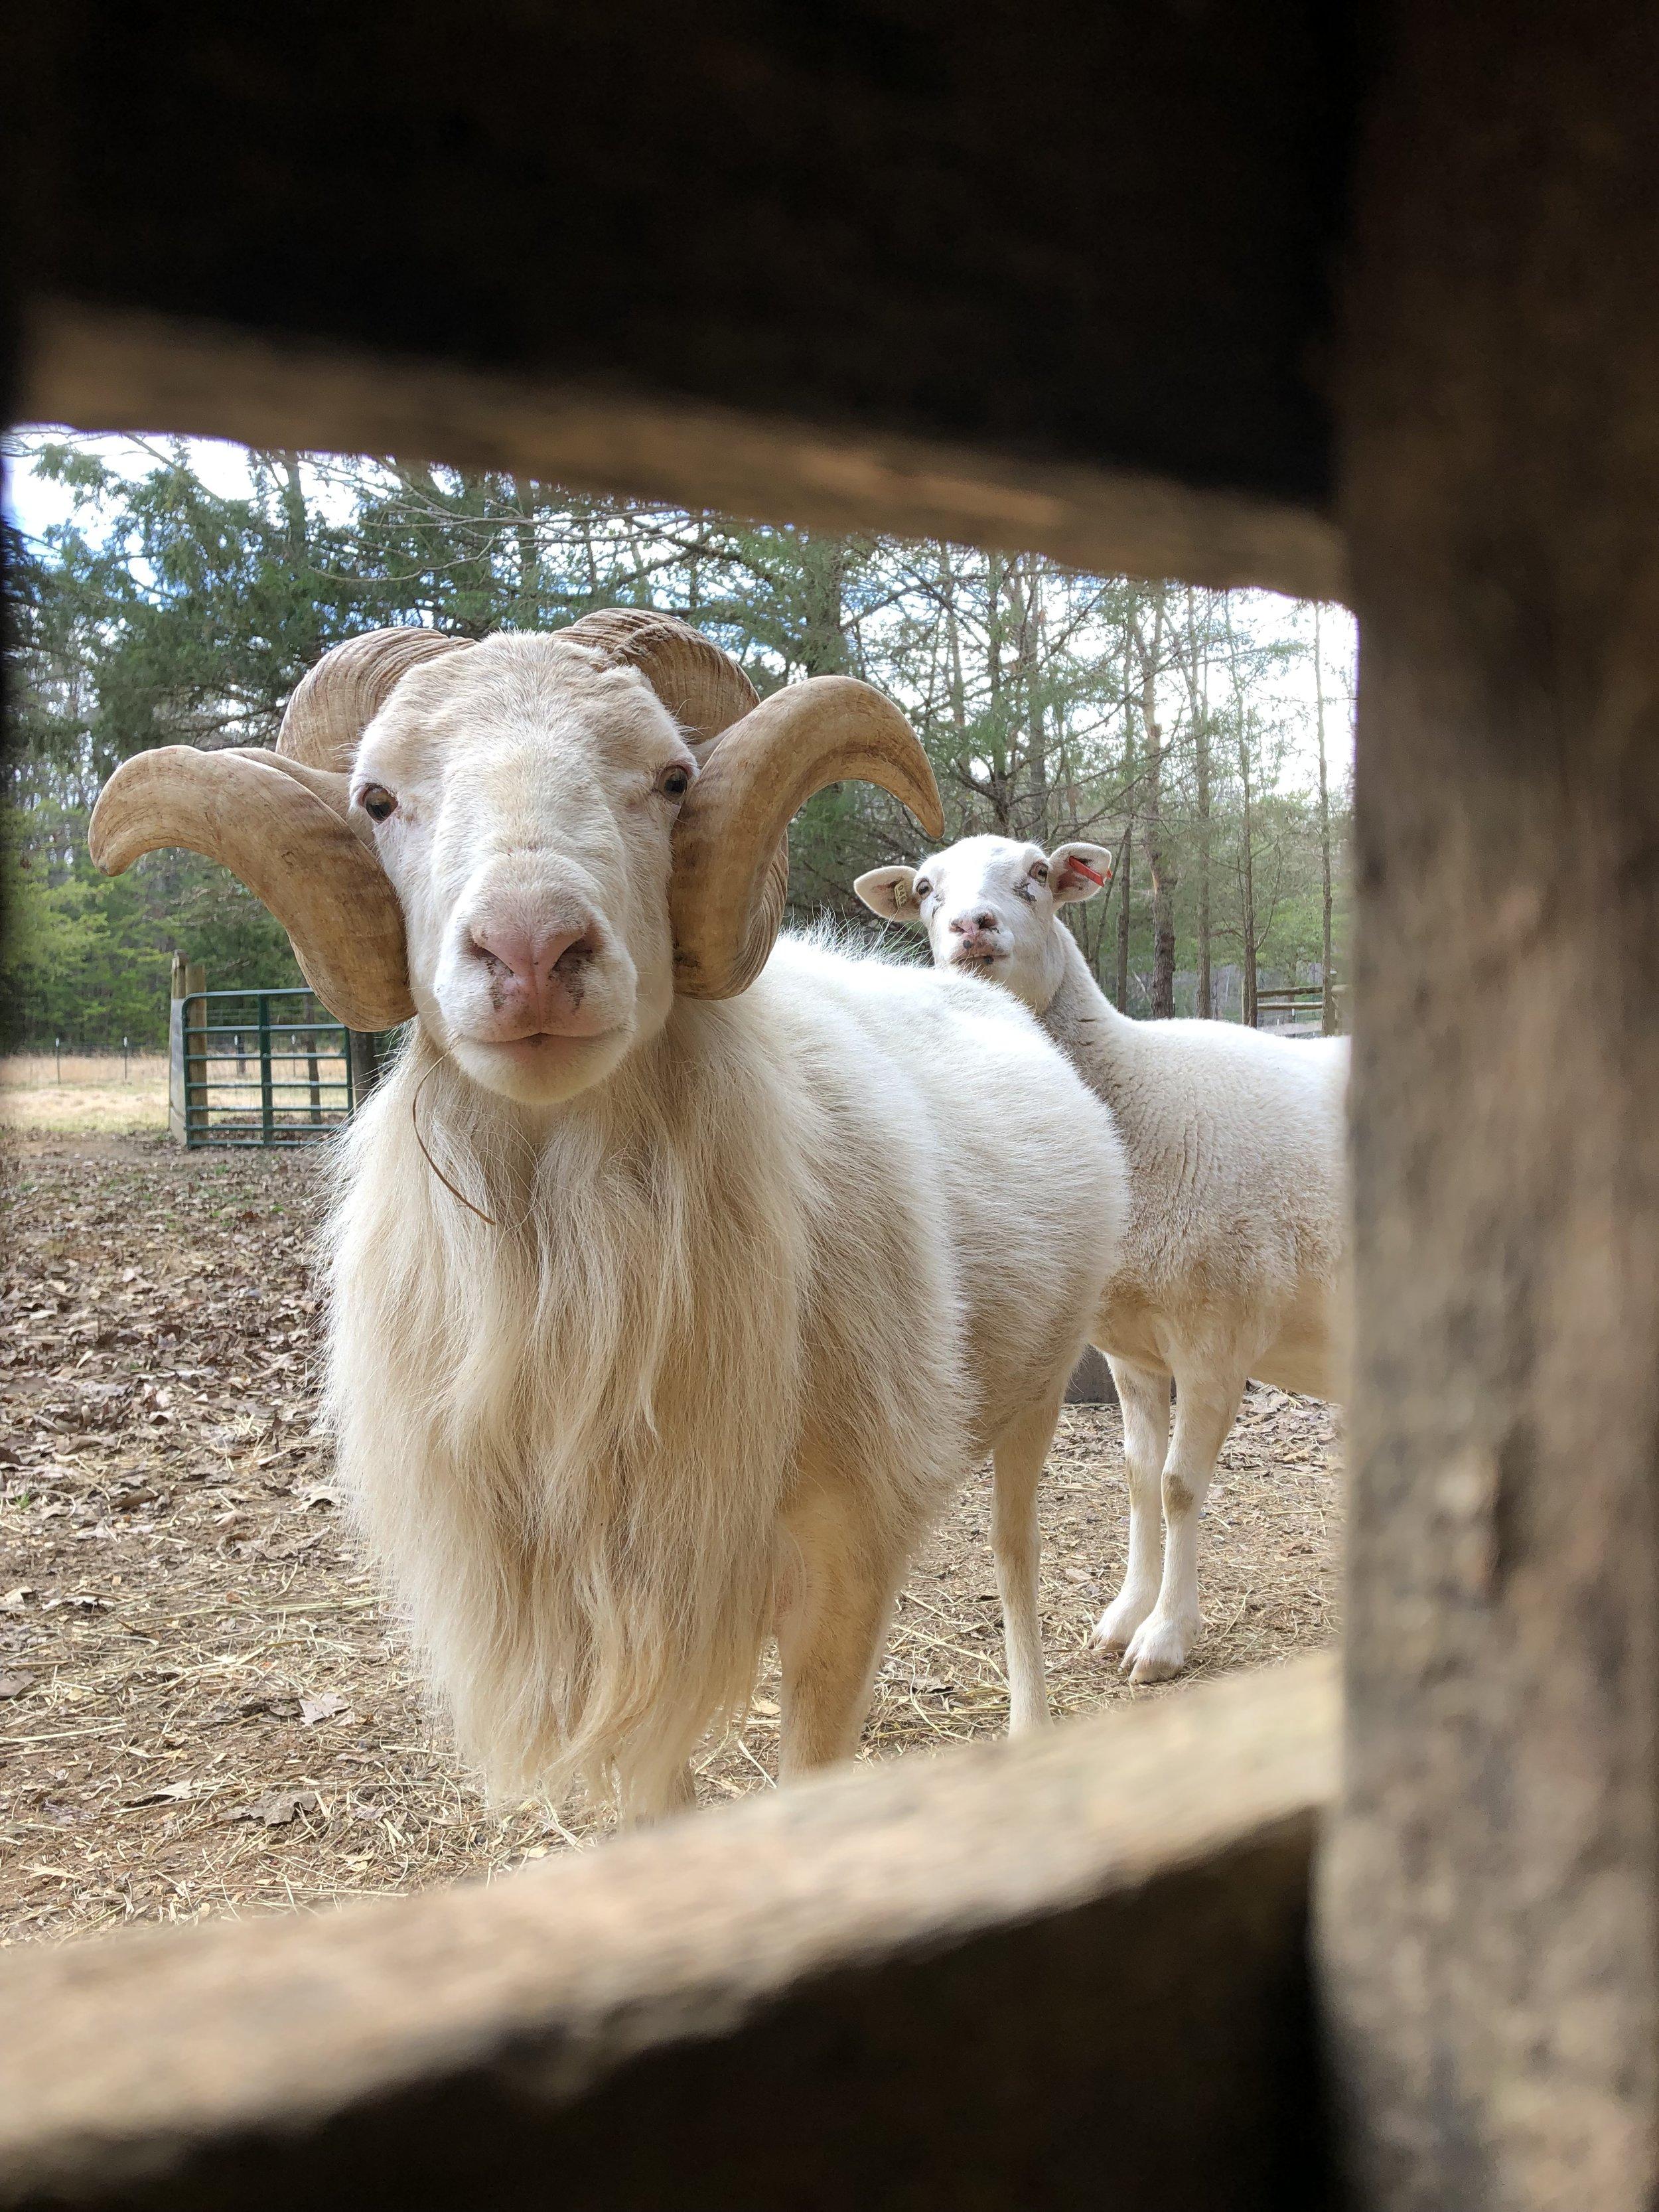 These Ain't Mariah Carey's Lambs